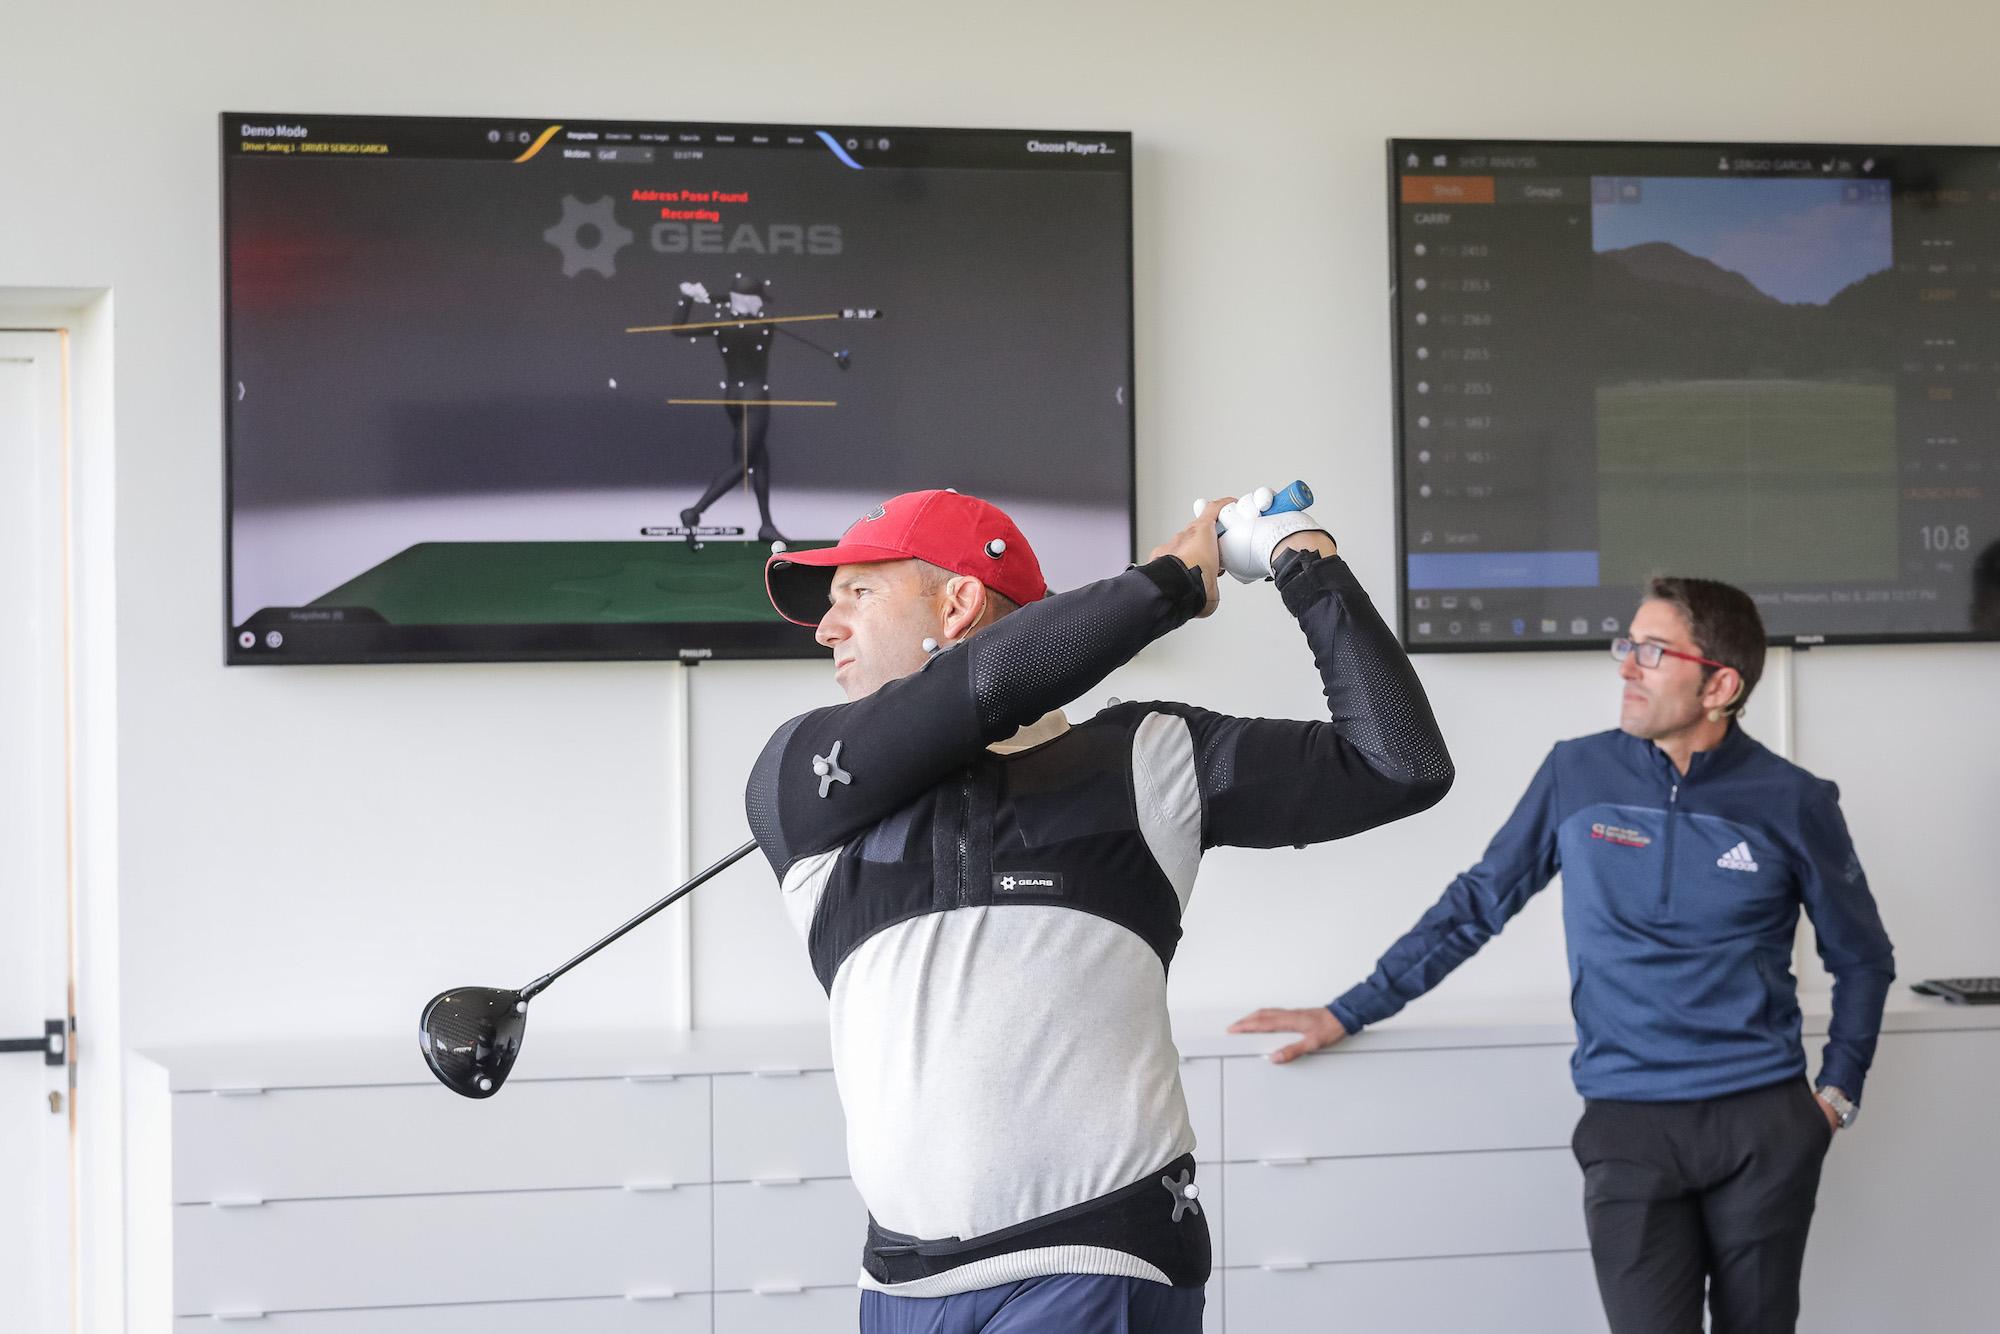 Sergio Garcia launches The Golf Hub at PGA La Catalunya